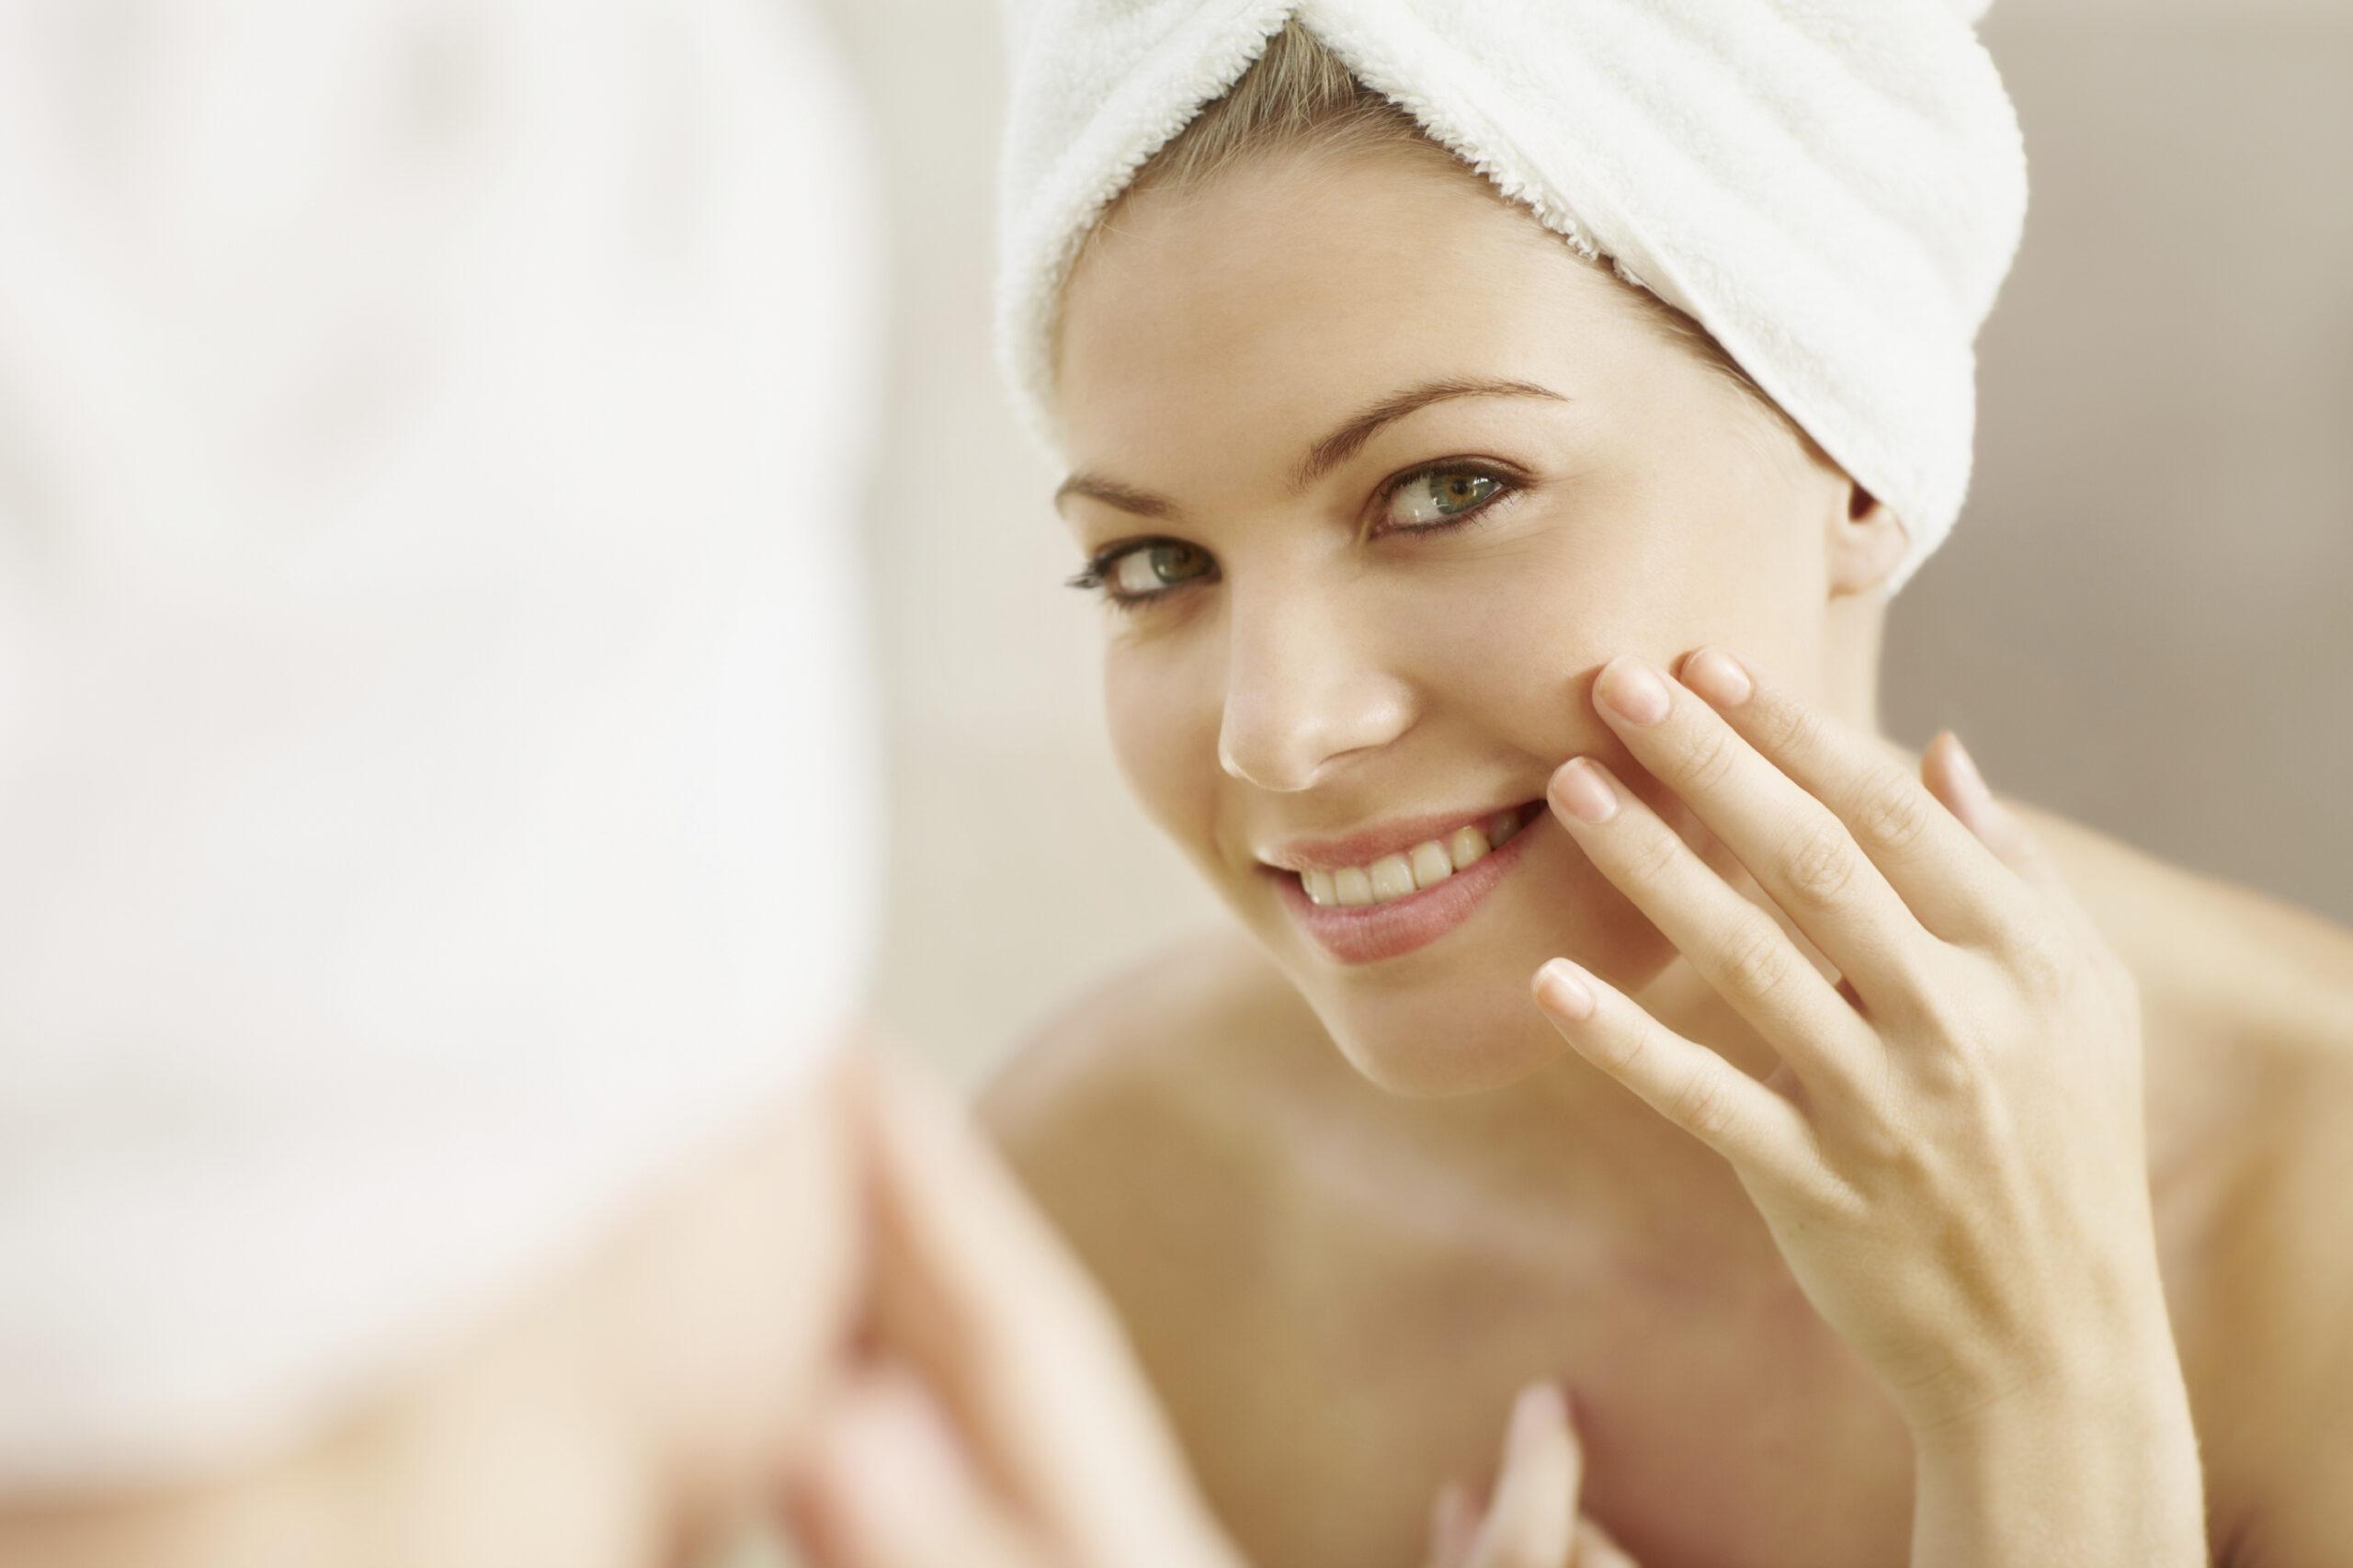 Top 10 Ayurvedic Remedies For Treating Burns At Home